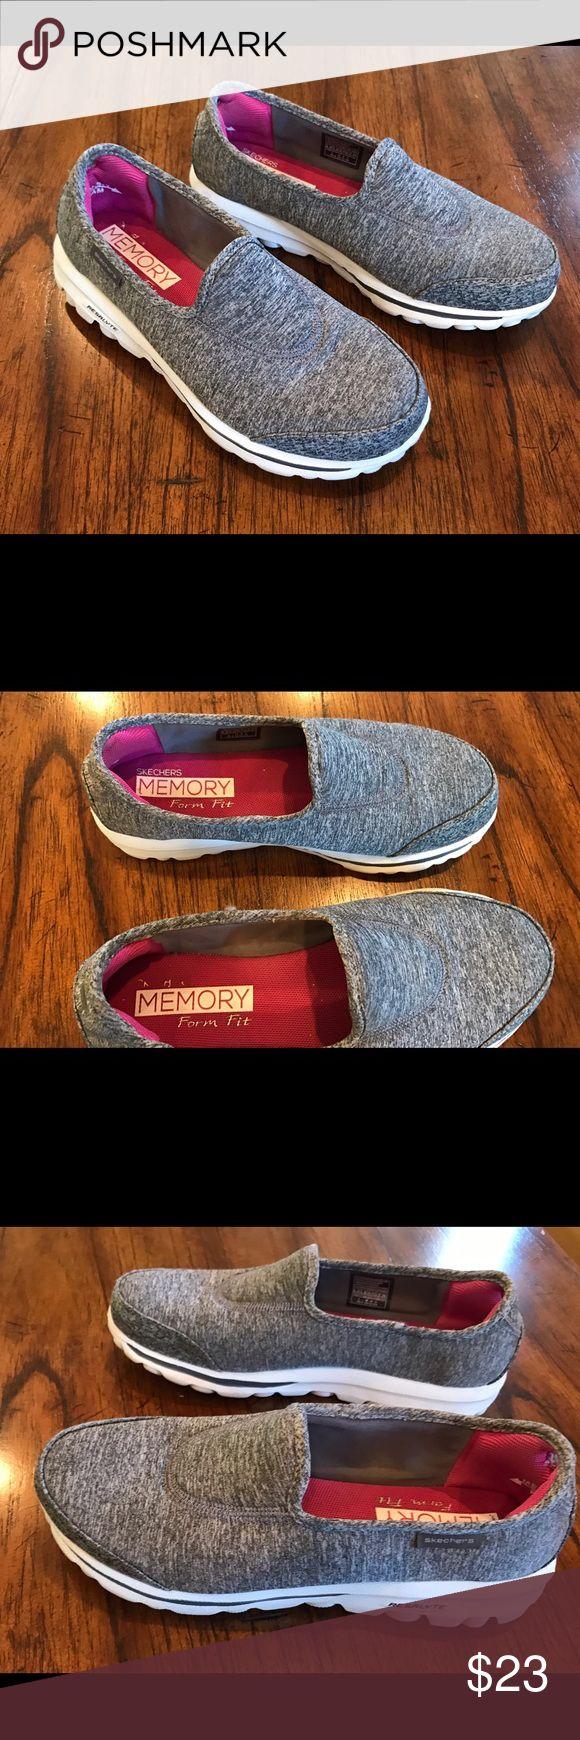 Sketchers Go Walk Gray 6.5 EUC worn once size 6.5 gray Skechers Shoes Sneakers